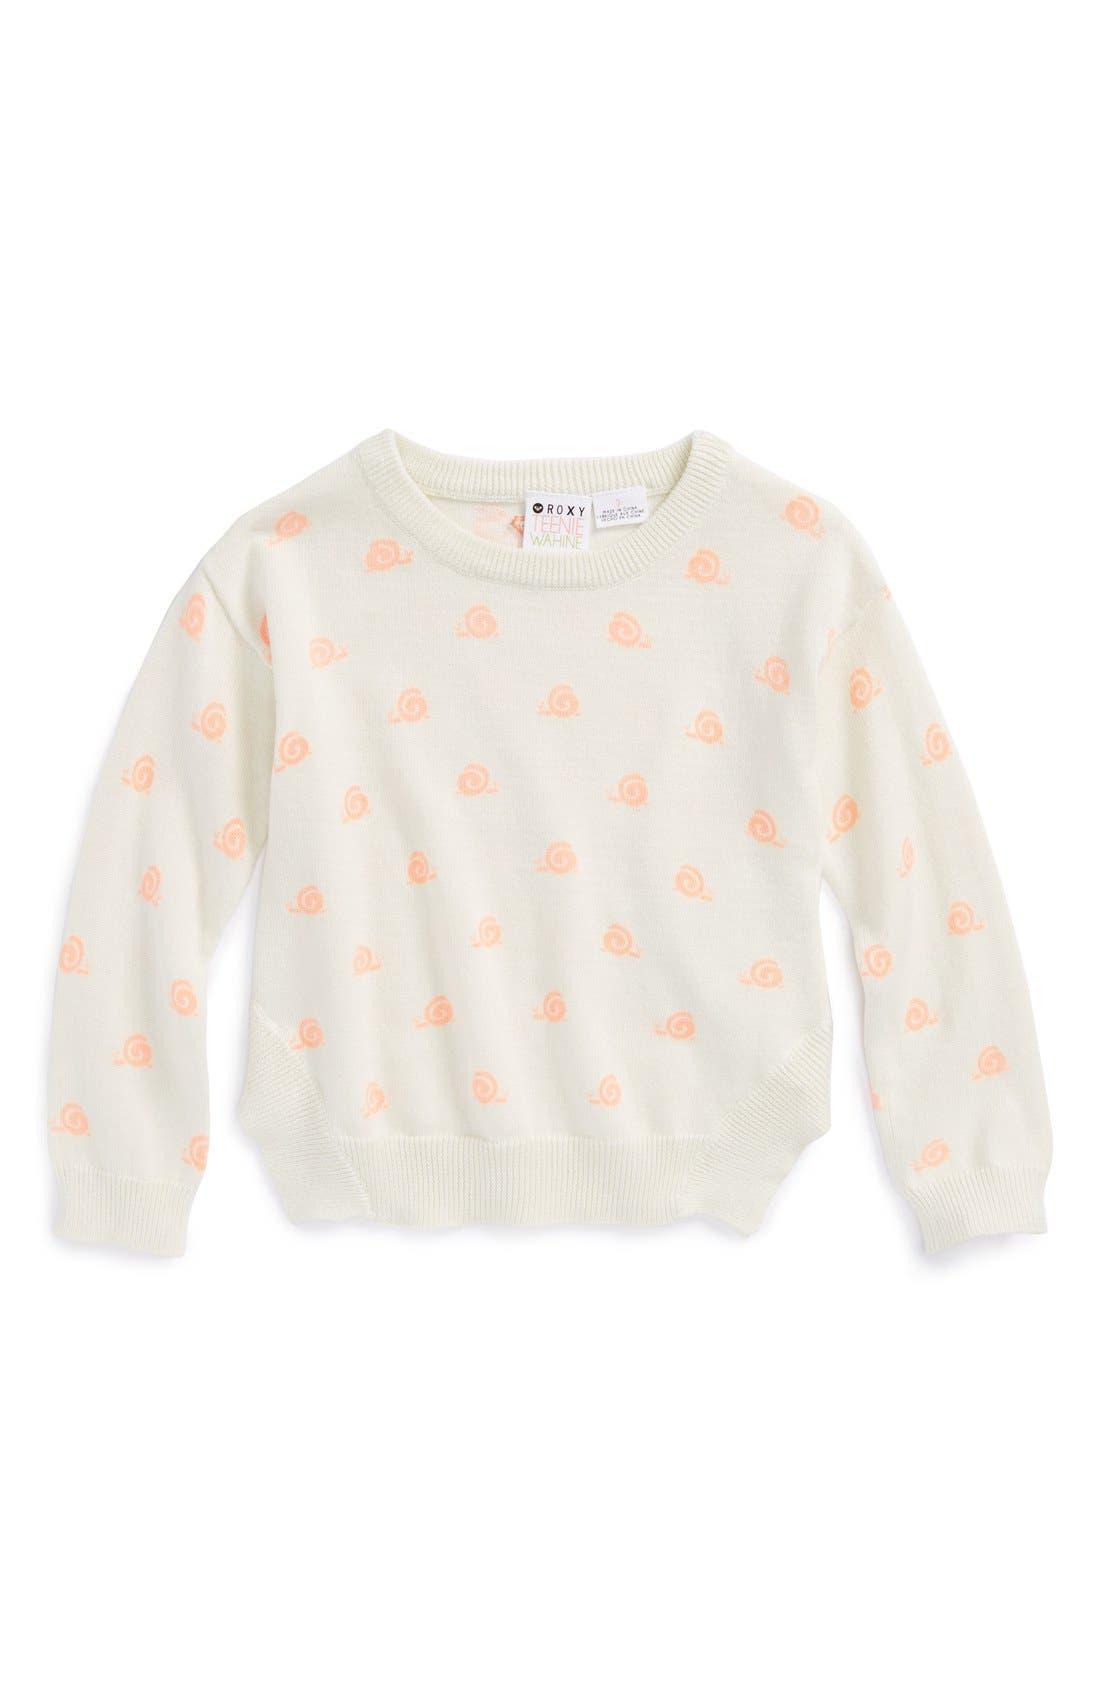 Alternate Image 1 Selected - Roxy 'Sea Pine' Sweater (Toddler Girls)